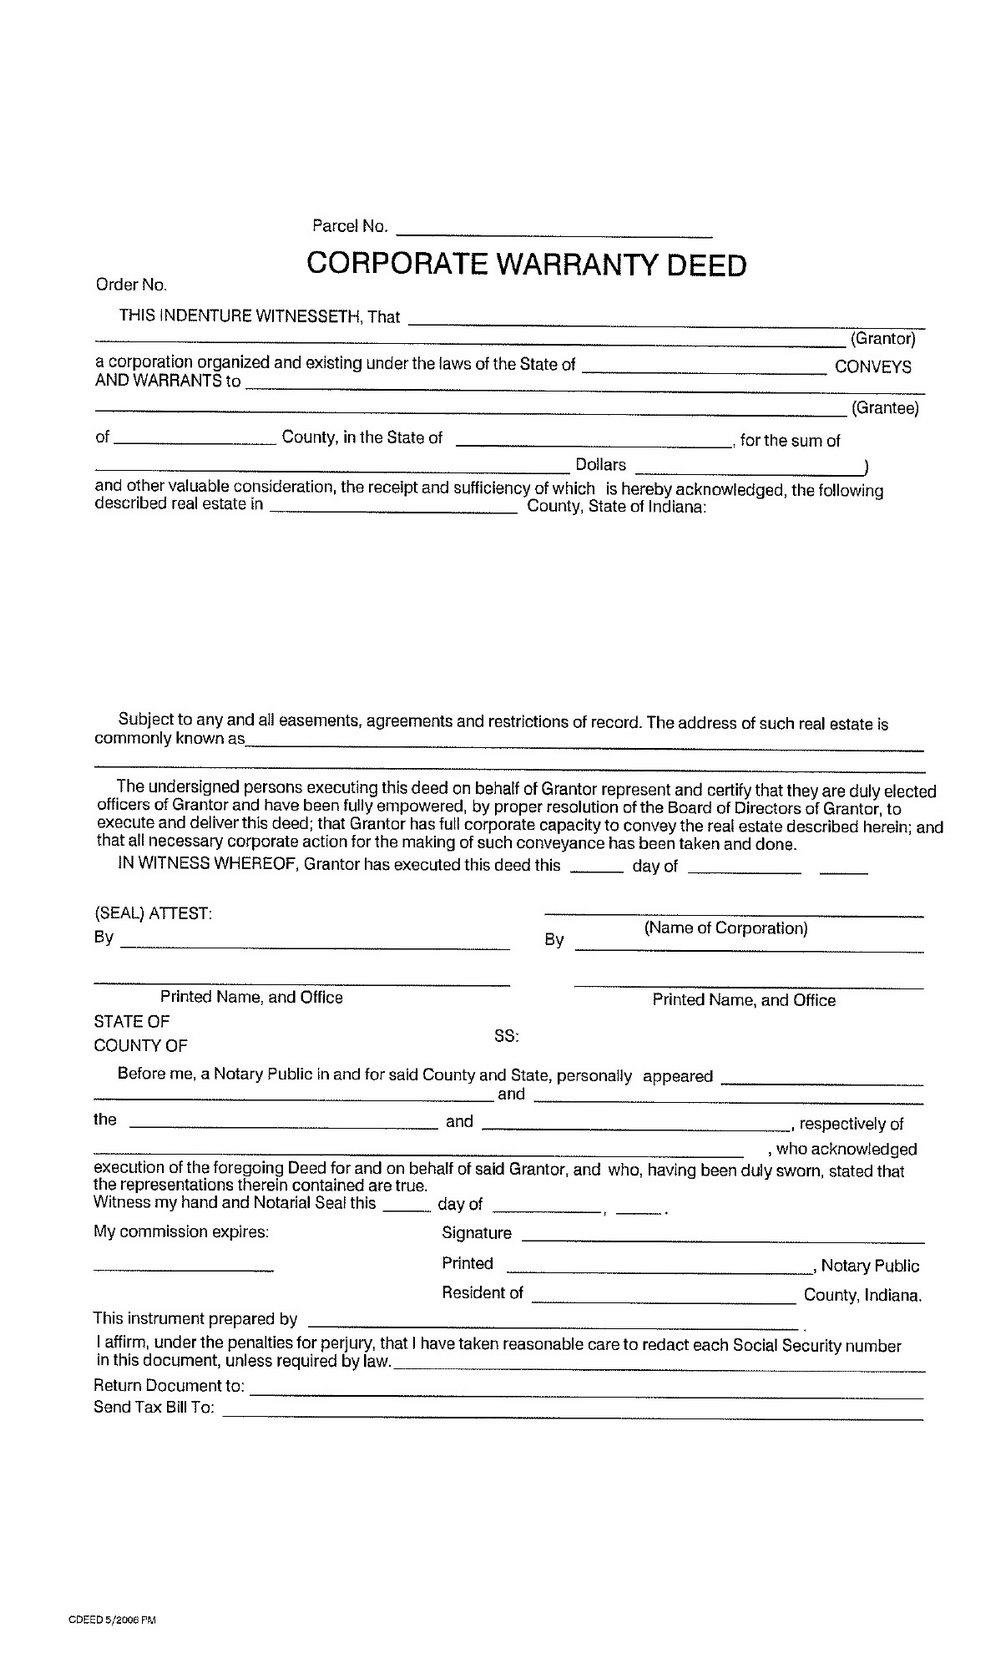 Texas Warranty Deed Form Free Download